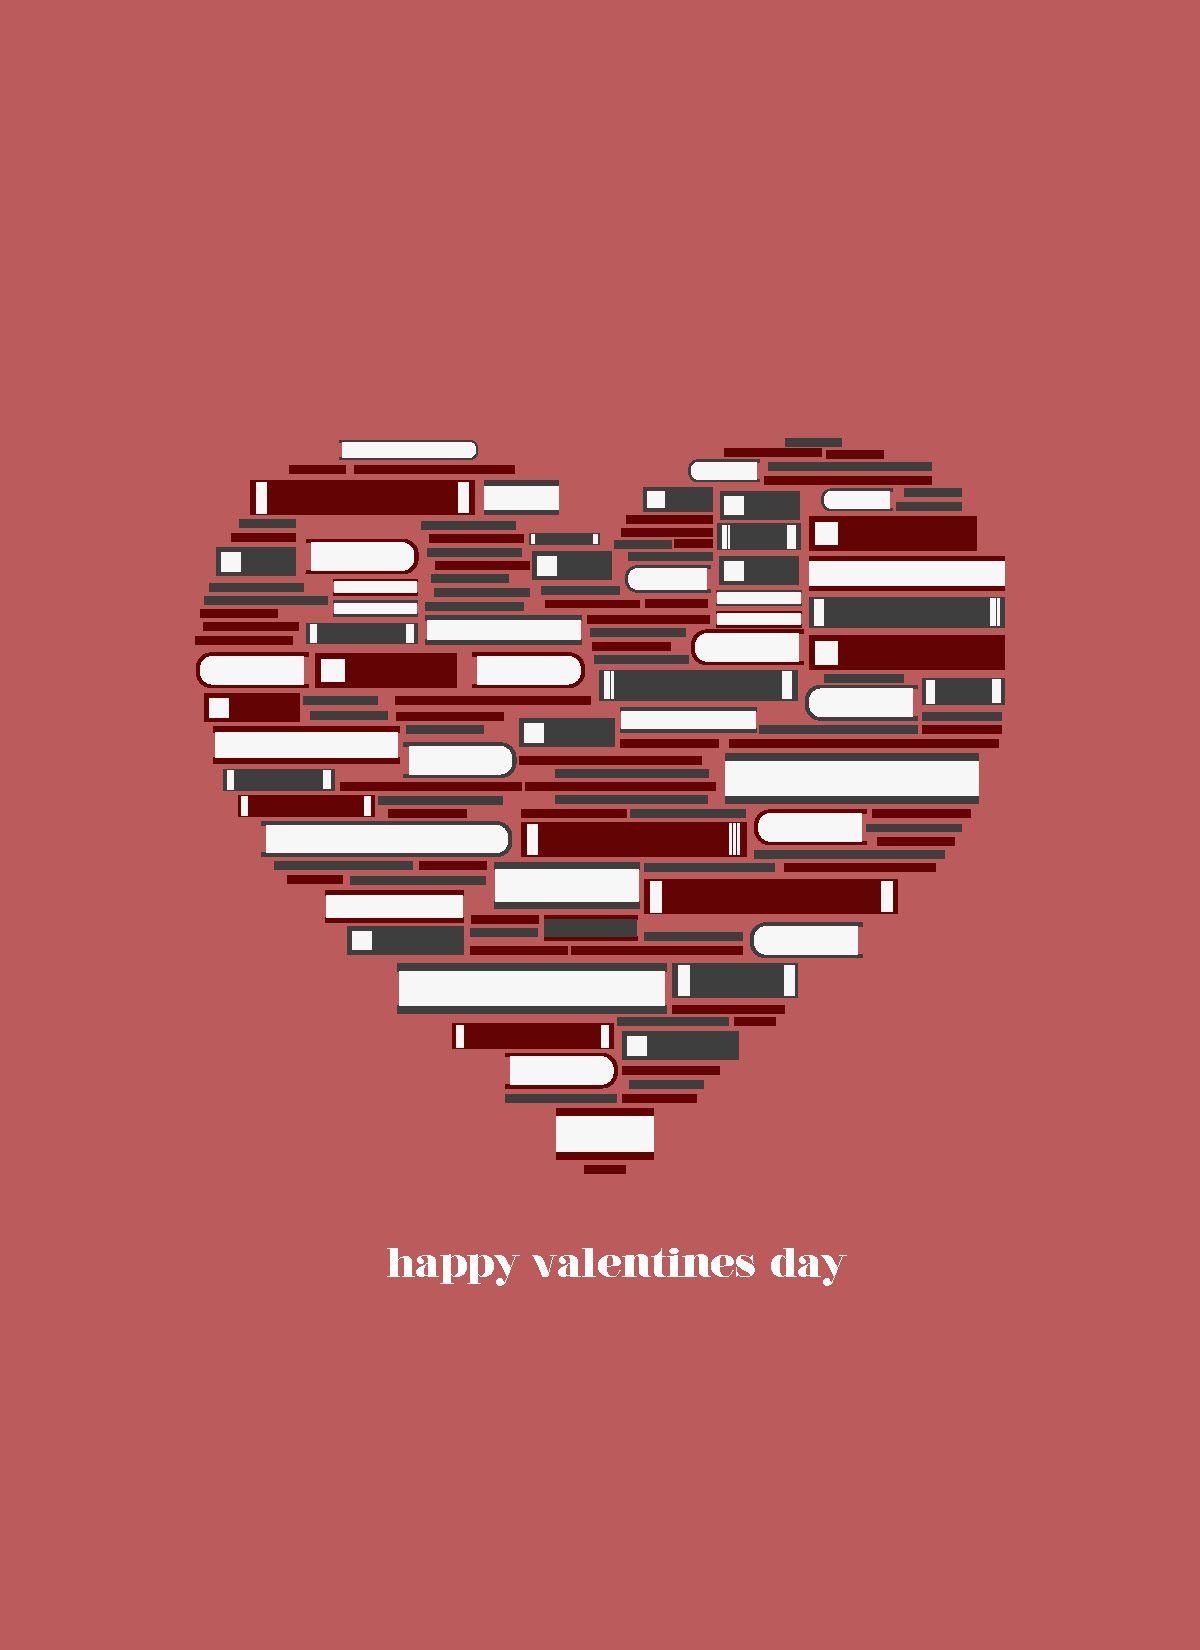 Athena massey red alert pictures to pin on pinterest - Happy Valentines Day Yerd Valentine Yearbook Books Love Design